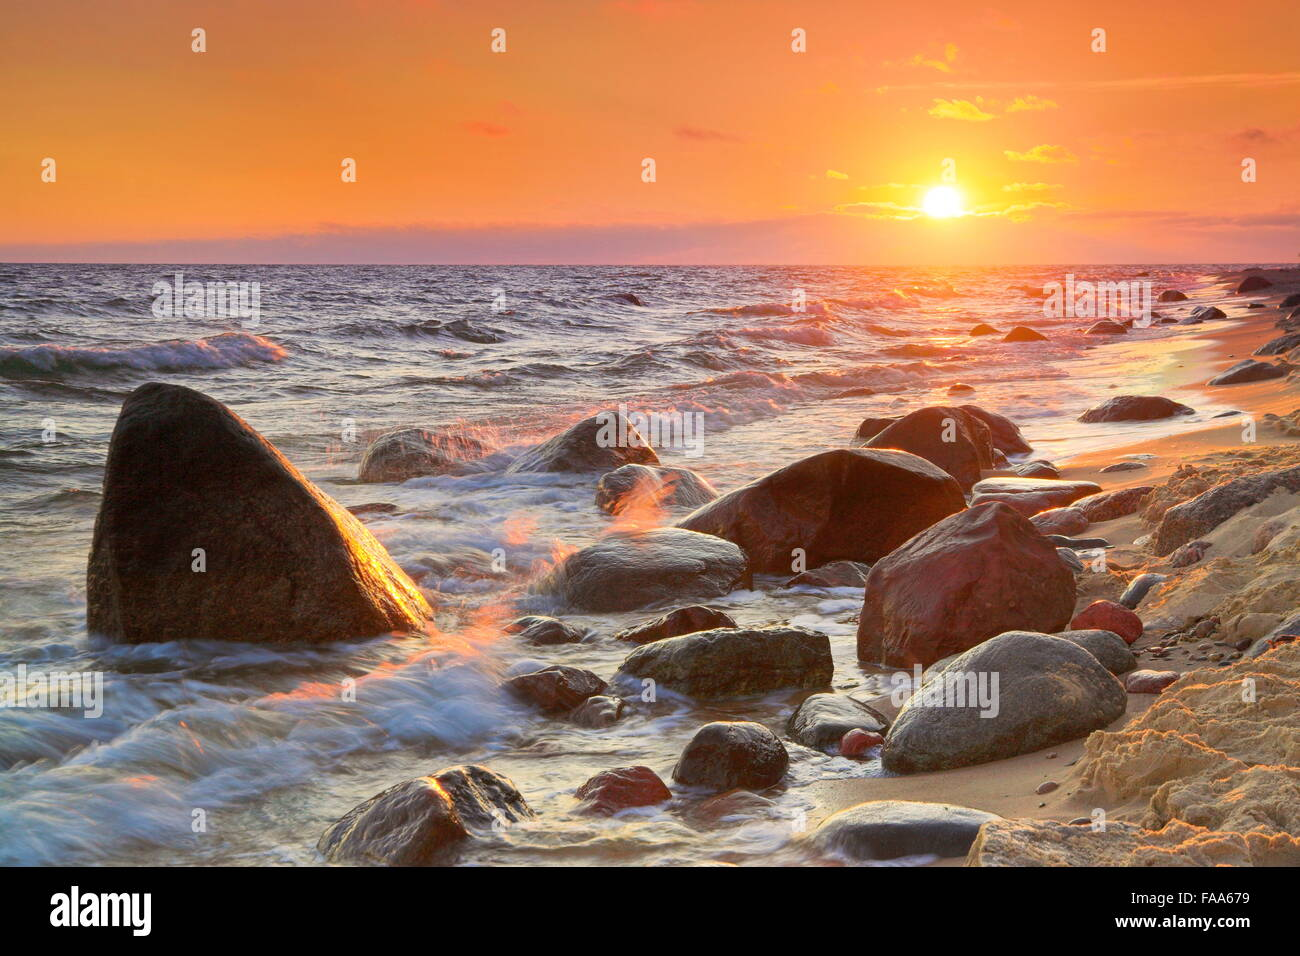 Sunset at Baltic Sea, Pomerania, Poland - Stock Image